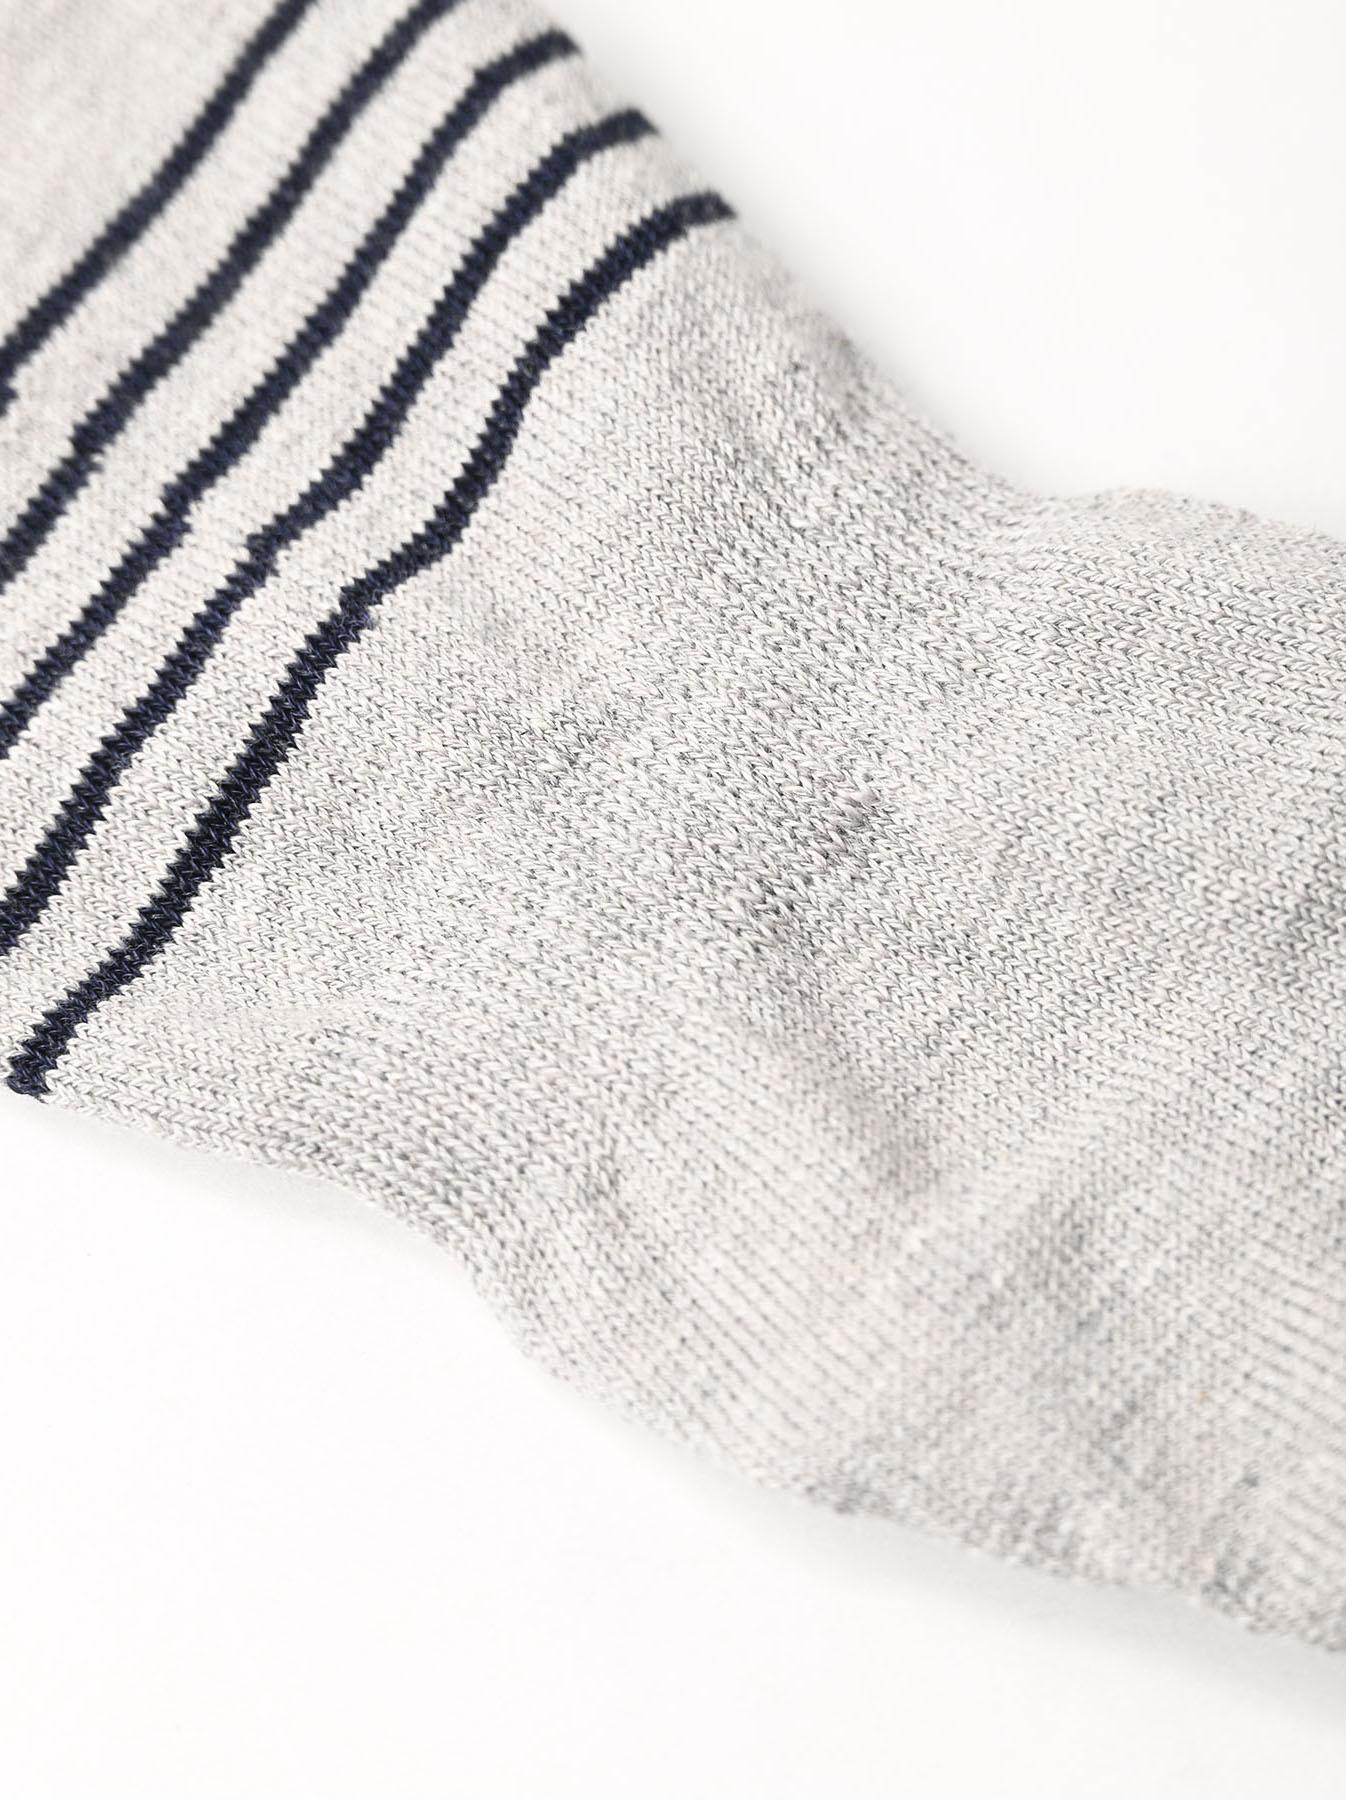 Basque Border Sole Socks (0321)-9